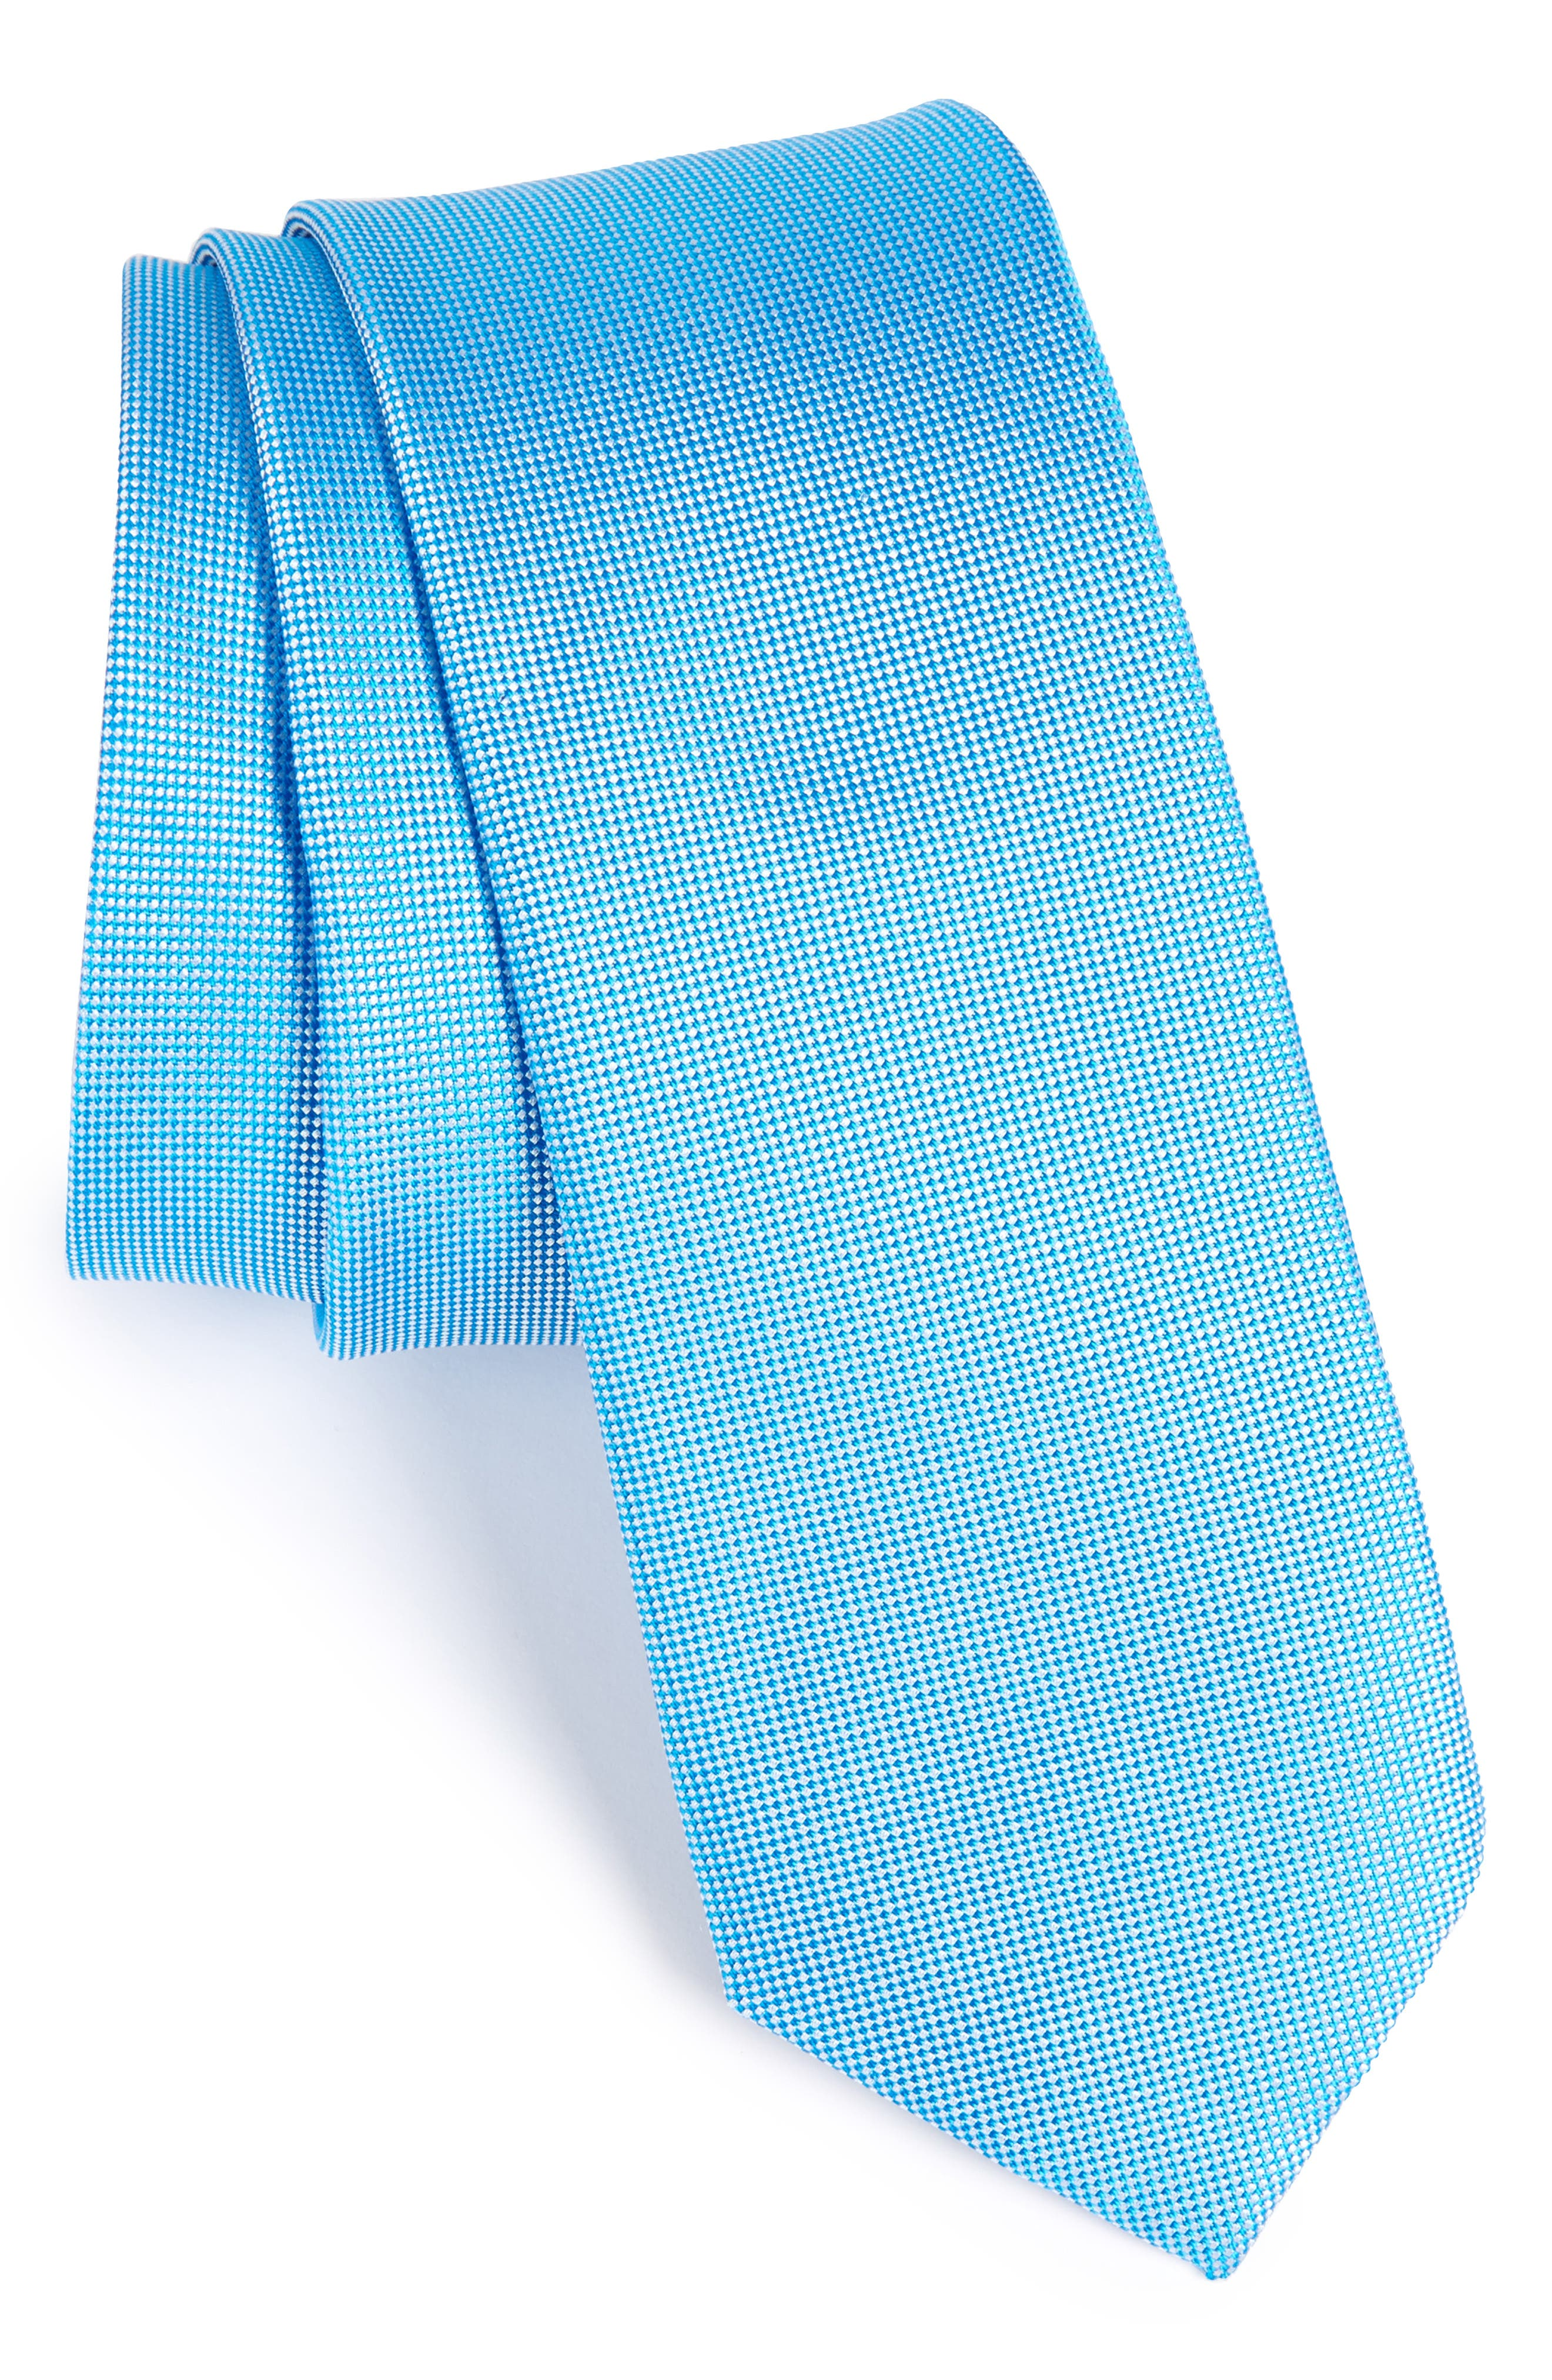 Alternate Image 1 Selected - Nordstrom Men's Shop Foley Silk Tie